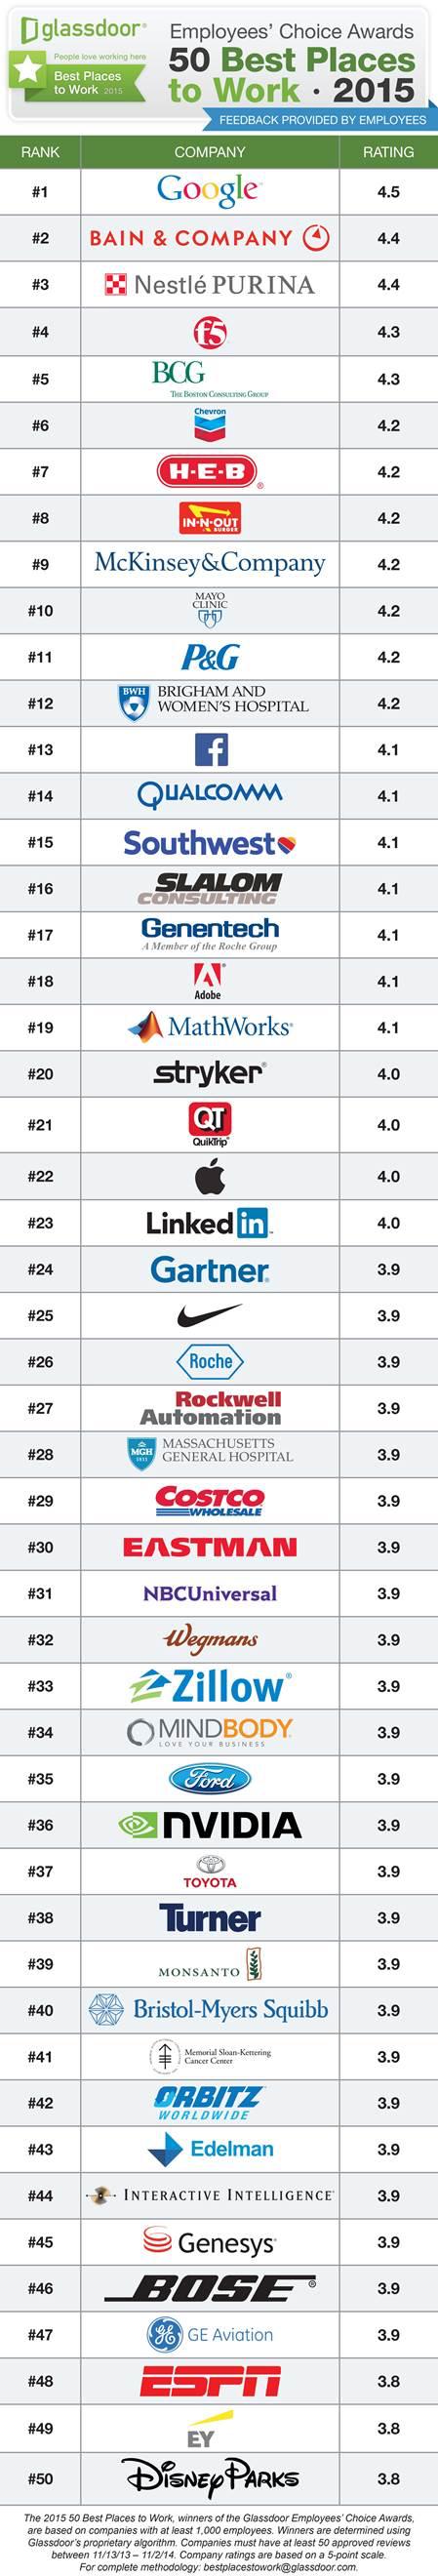 Top 50 companies